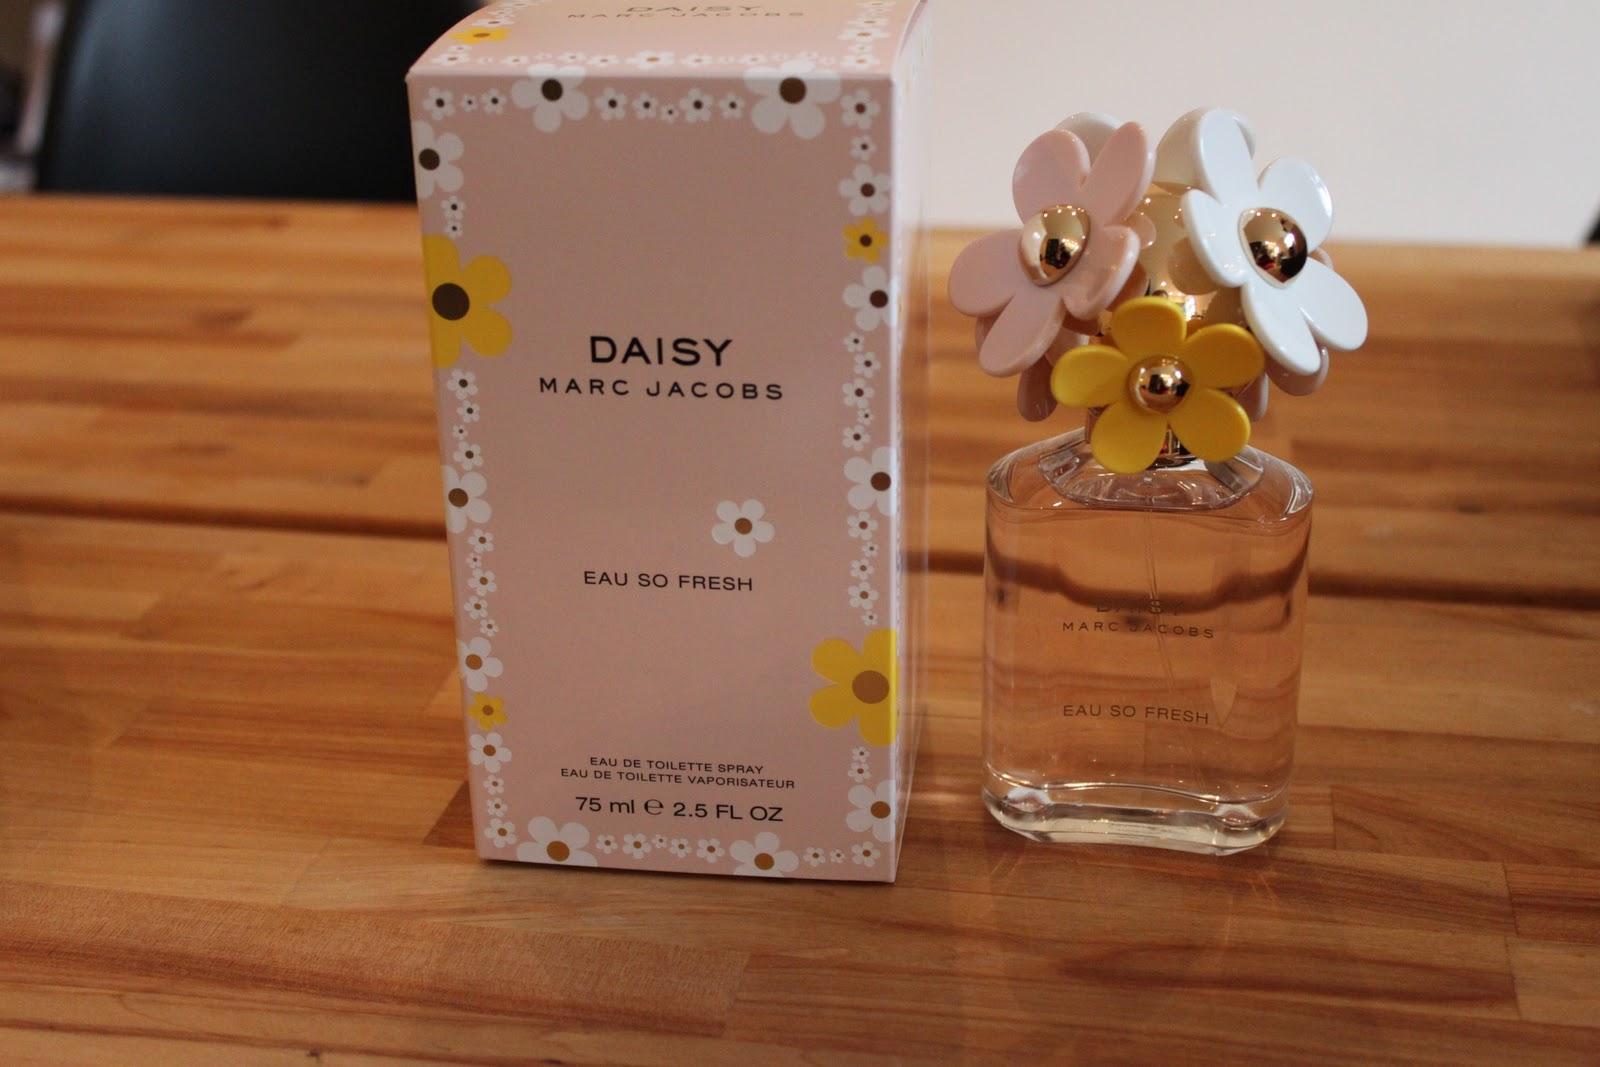 den nye marc jacobs parfume